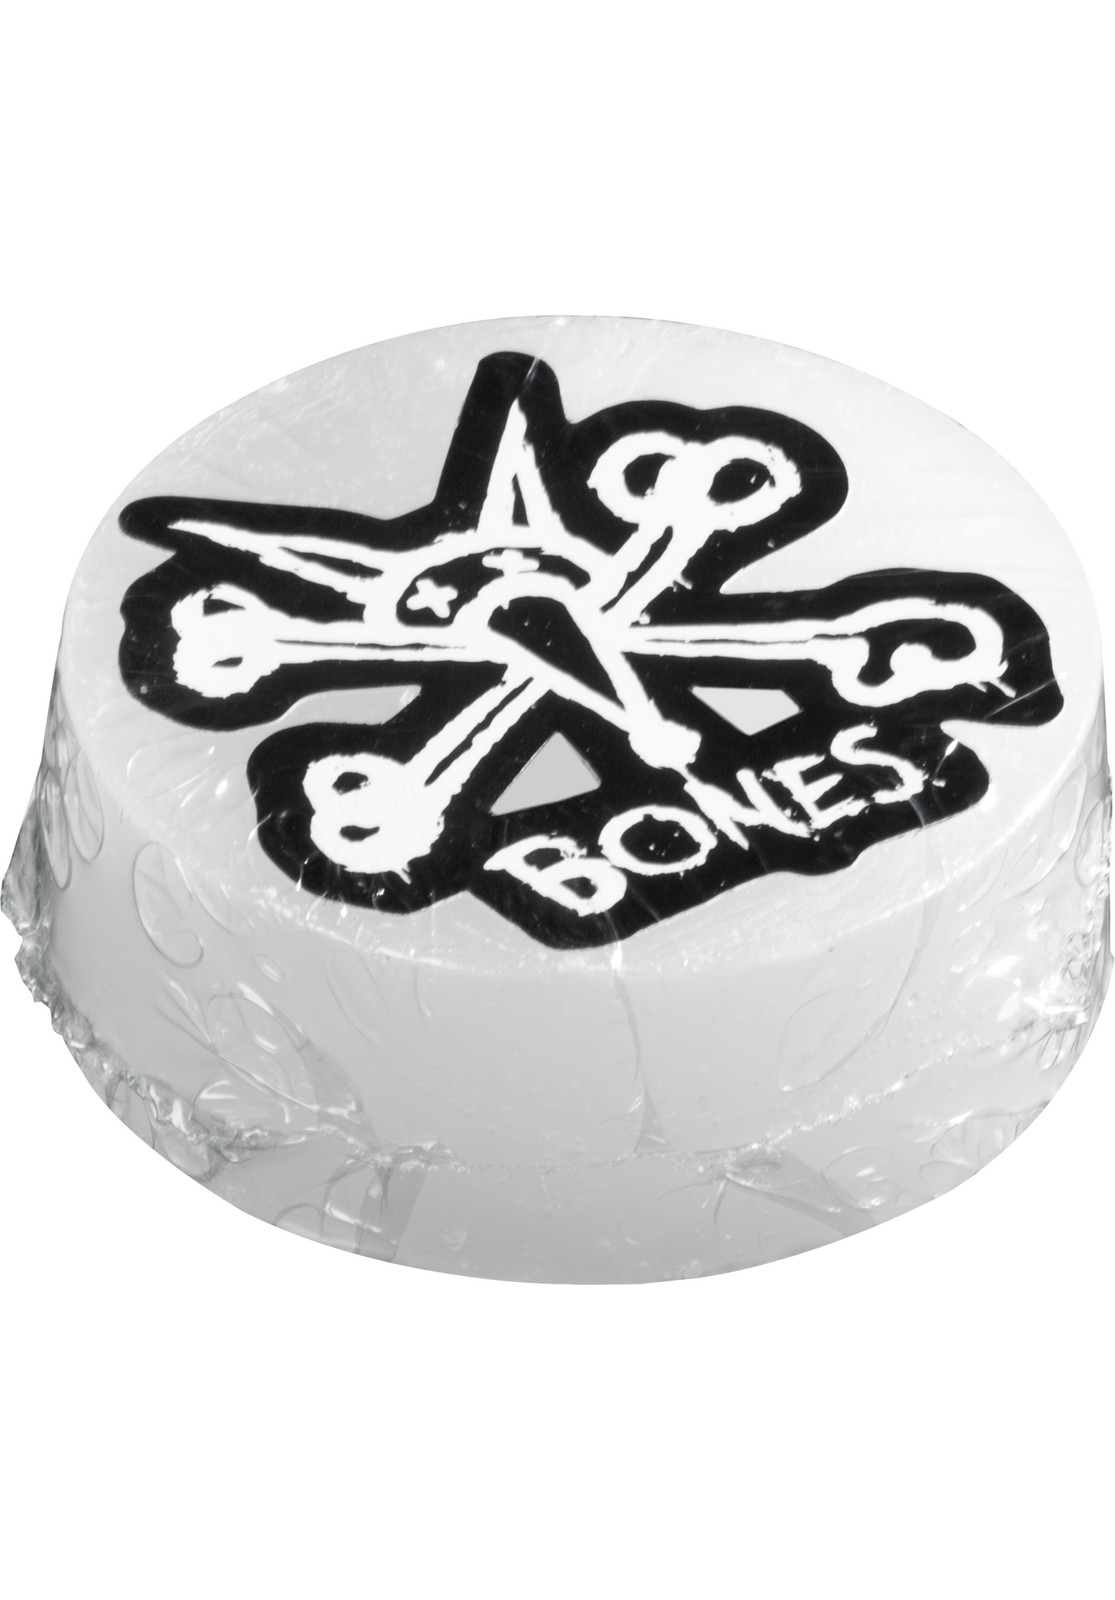 Skatewax Bones Wheels Vato Rat